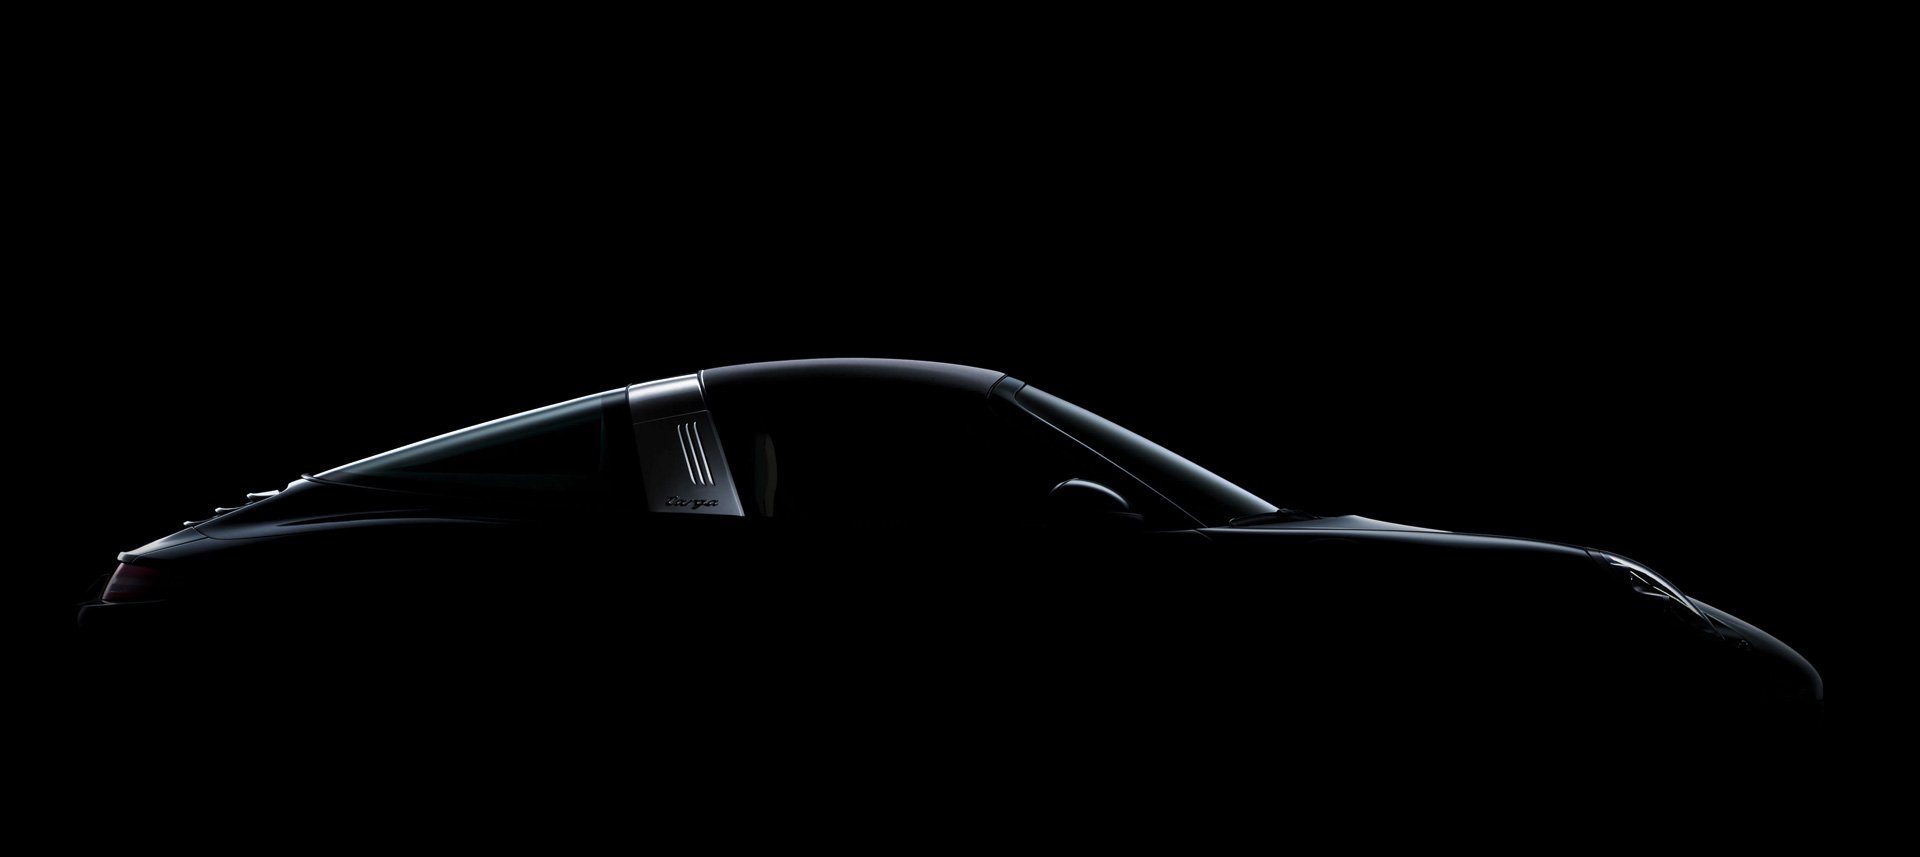 Porsche Targa | Uwe Breitkopf Photography